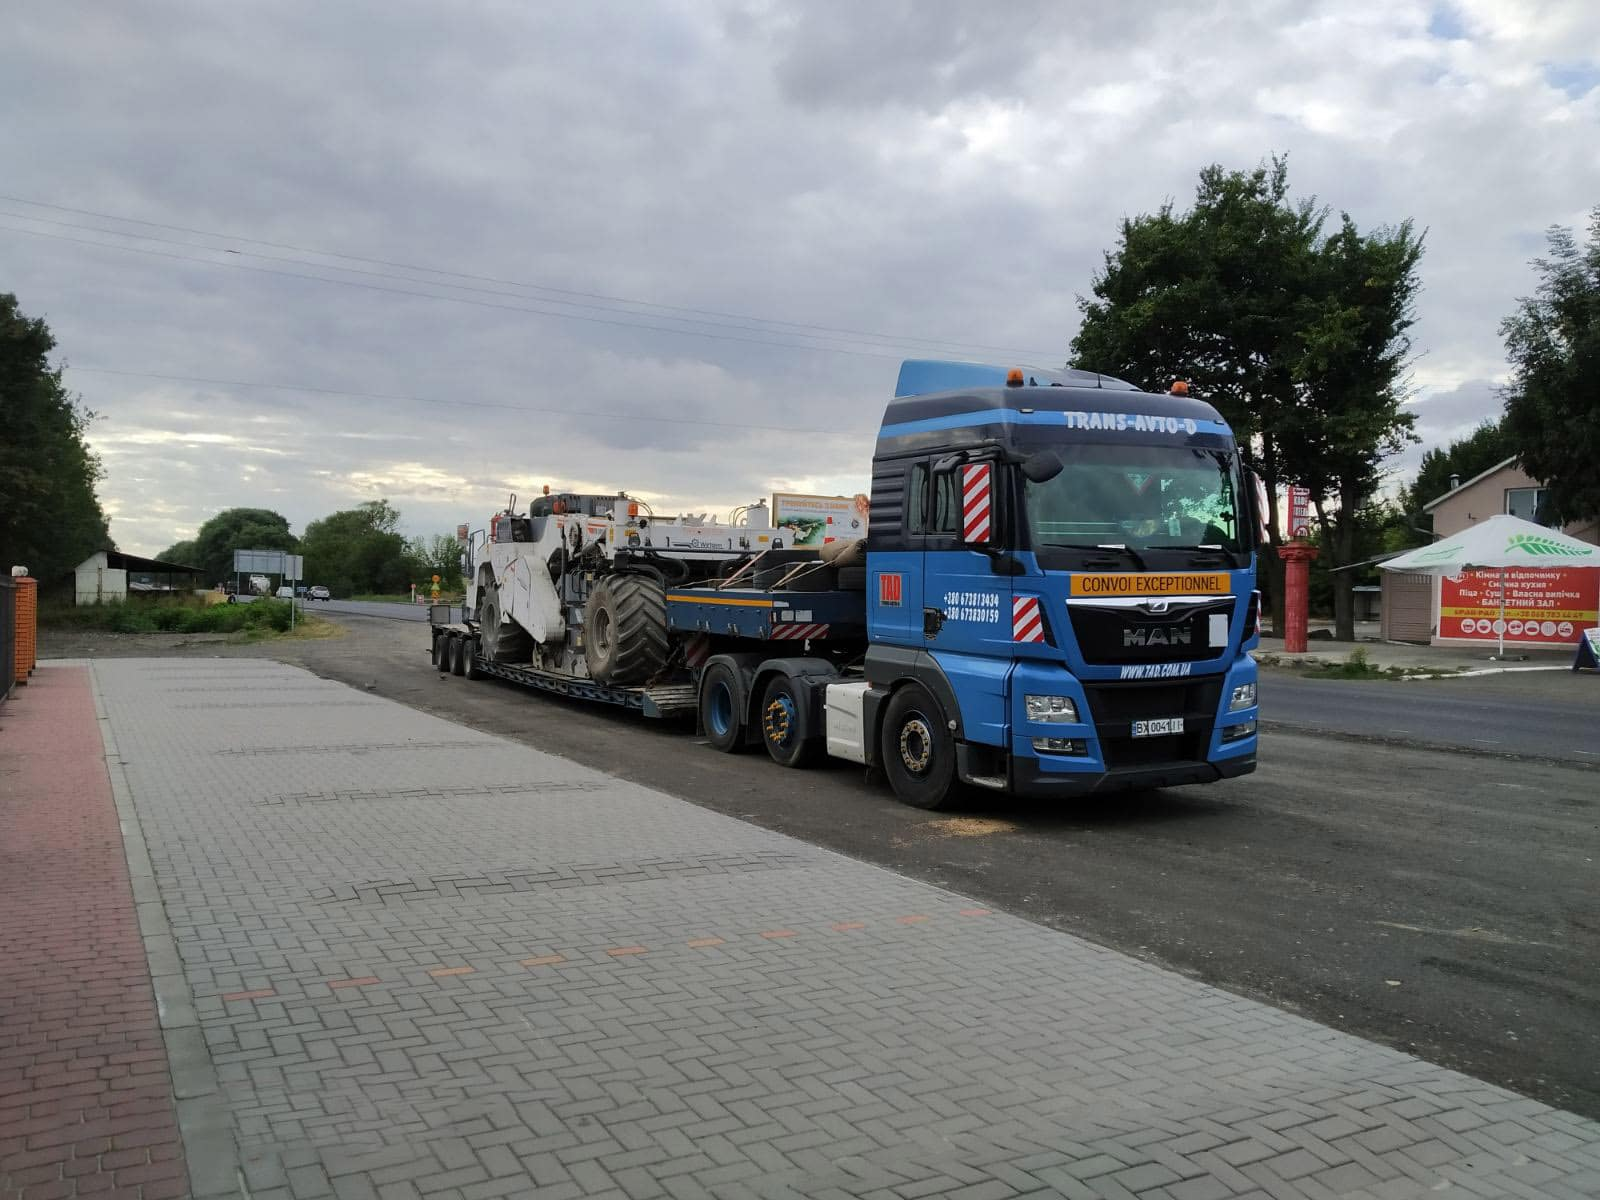 Transportation of a Wirtgen asphalt recycler. Dimensions 3.2 mx 3.2 mx 8.8 m -2